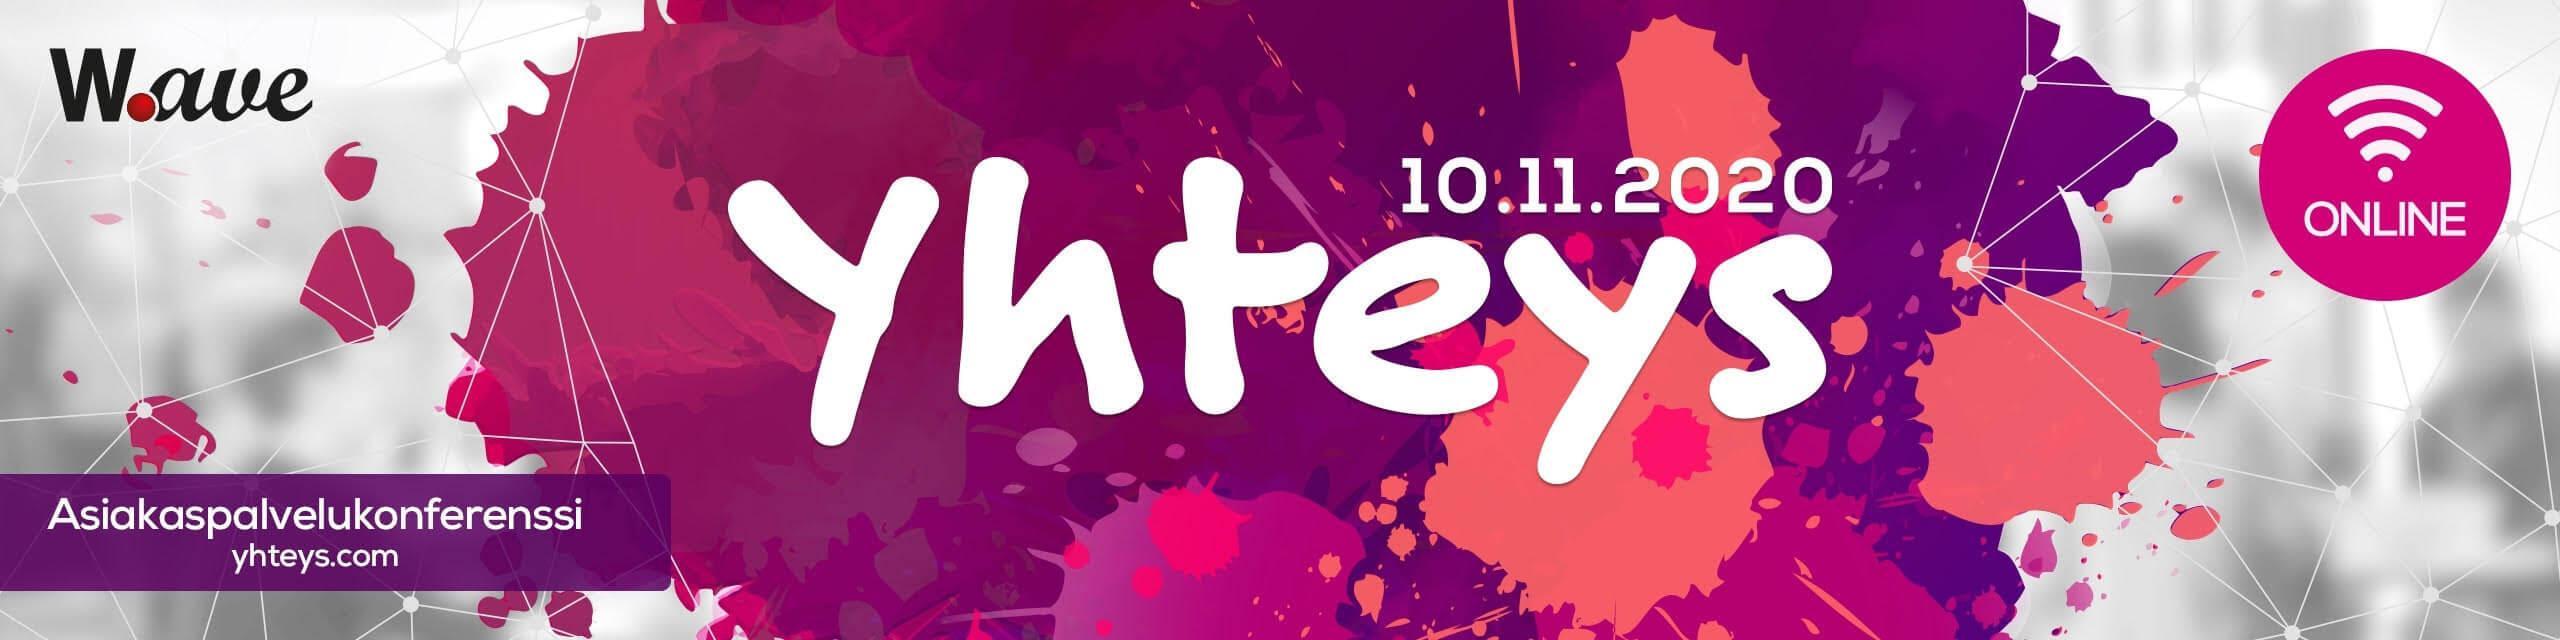 yhteys2020-banner